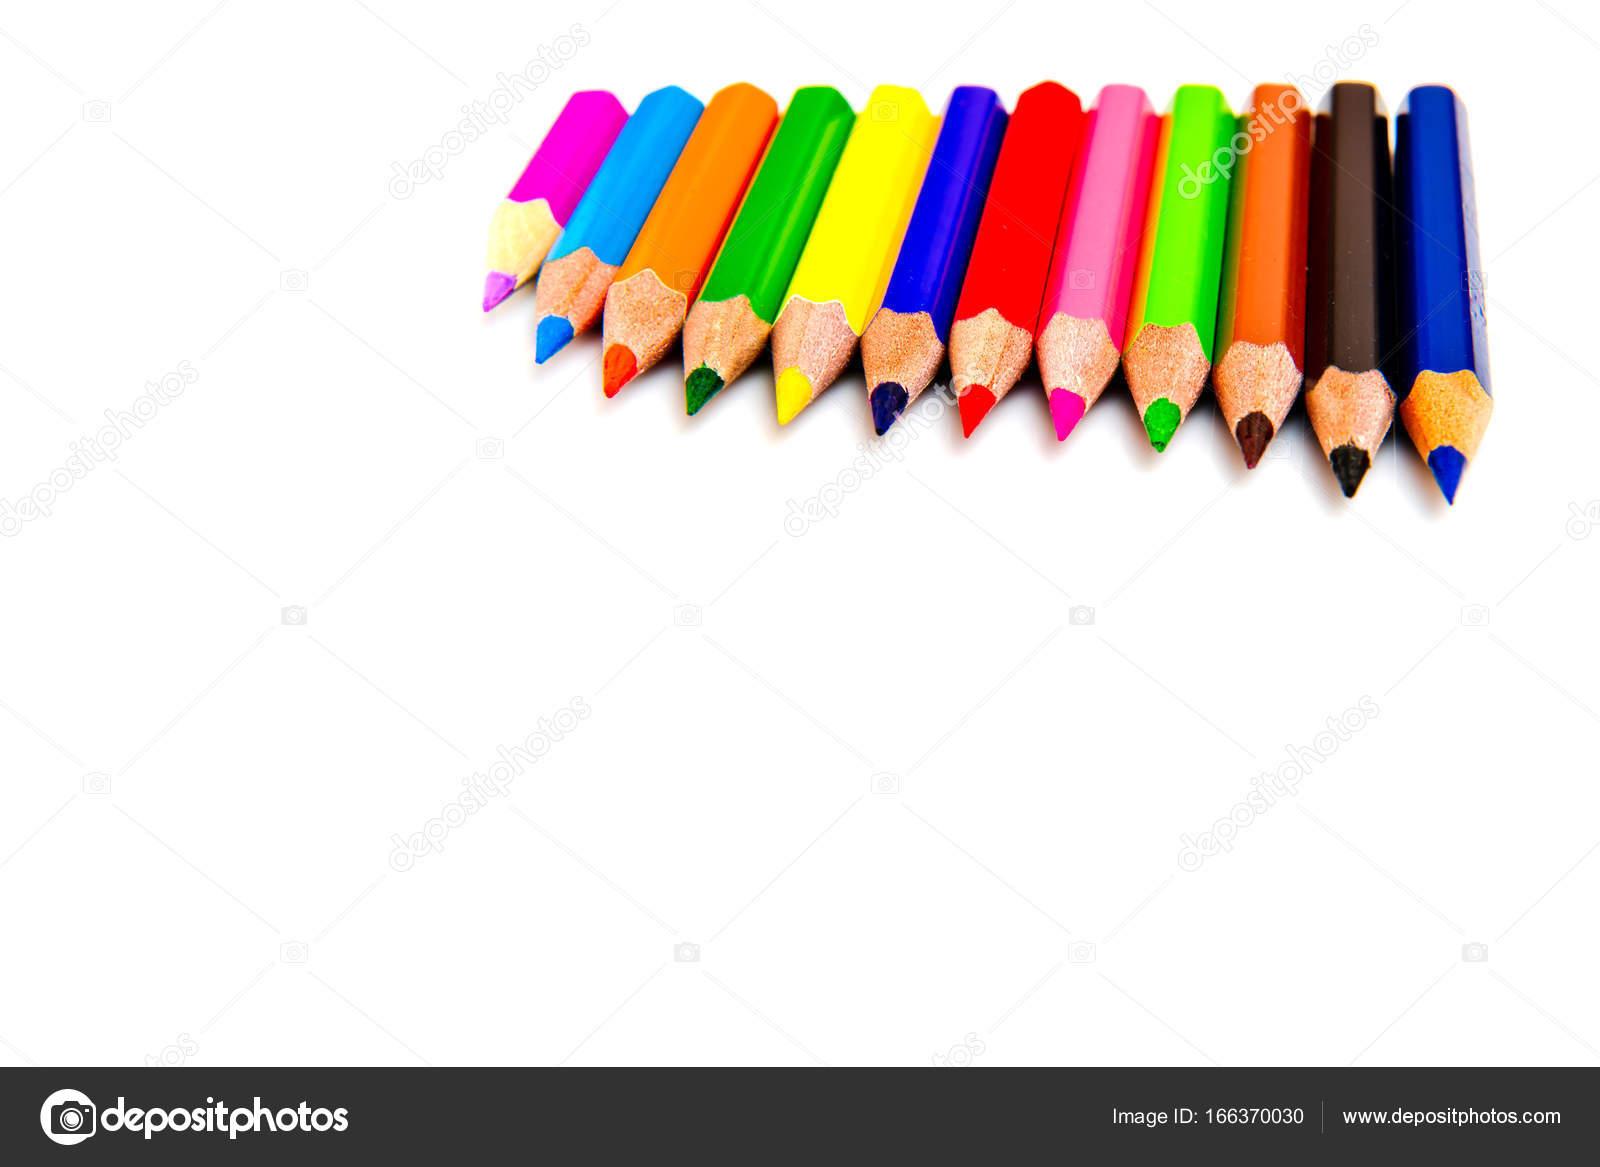 b809c0c098 Πολύχρωμα μολύβια που απομονώνονται σε λευκό φόντο. Σχολικά είδη —  Φωτογραφία Αρχείου